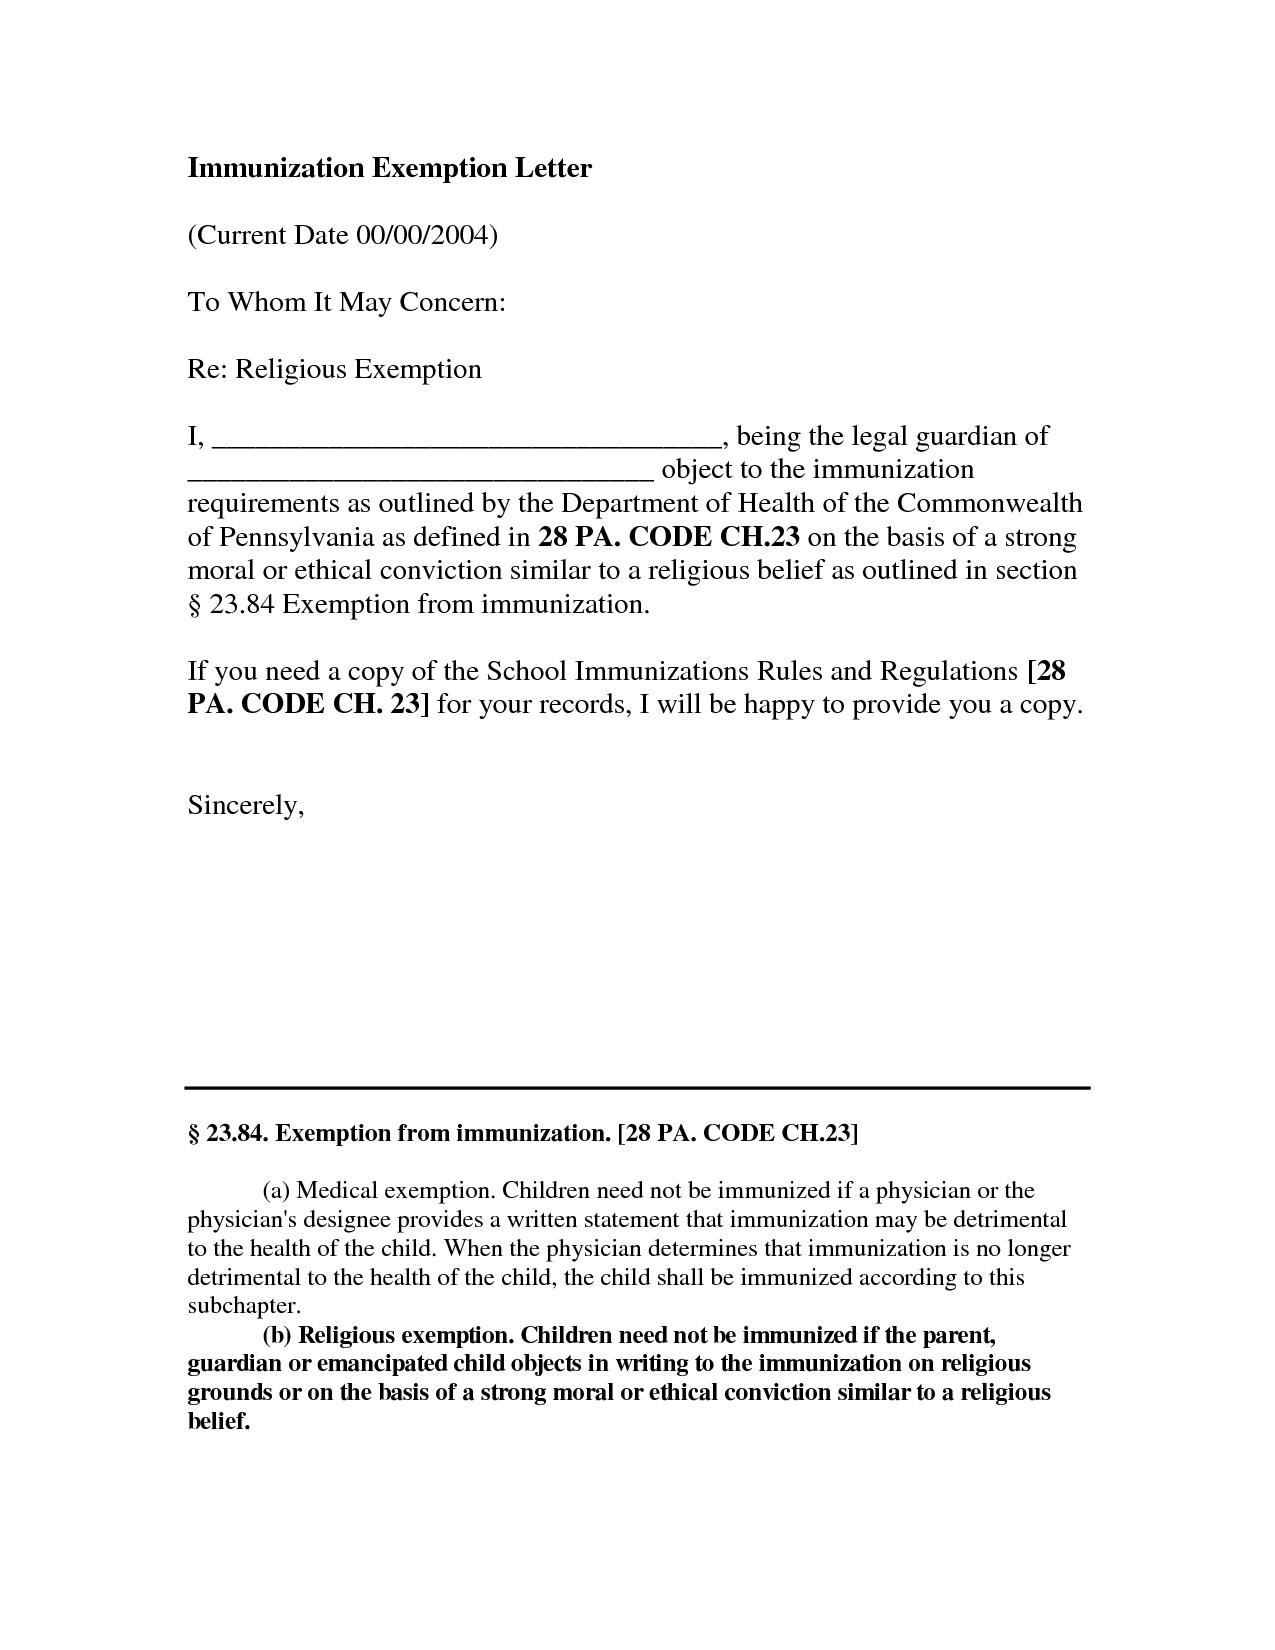 e84828f9317469901f16394d1ef7a688 Vaccination Exemption Letter Template on homestead letter, annulment letter, concession letter, objection letter, claim letter, deferral letter, mandate letter,